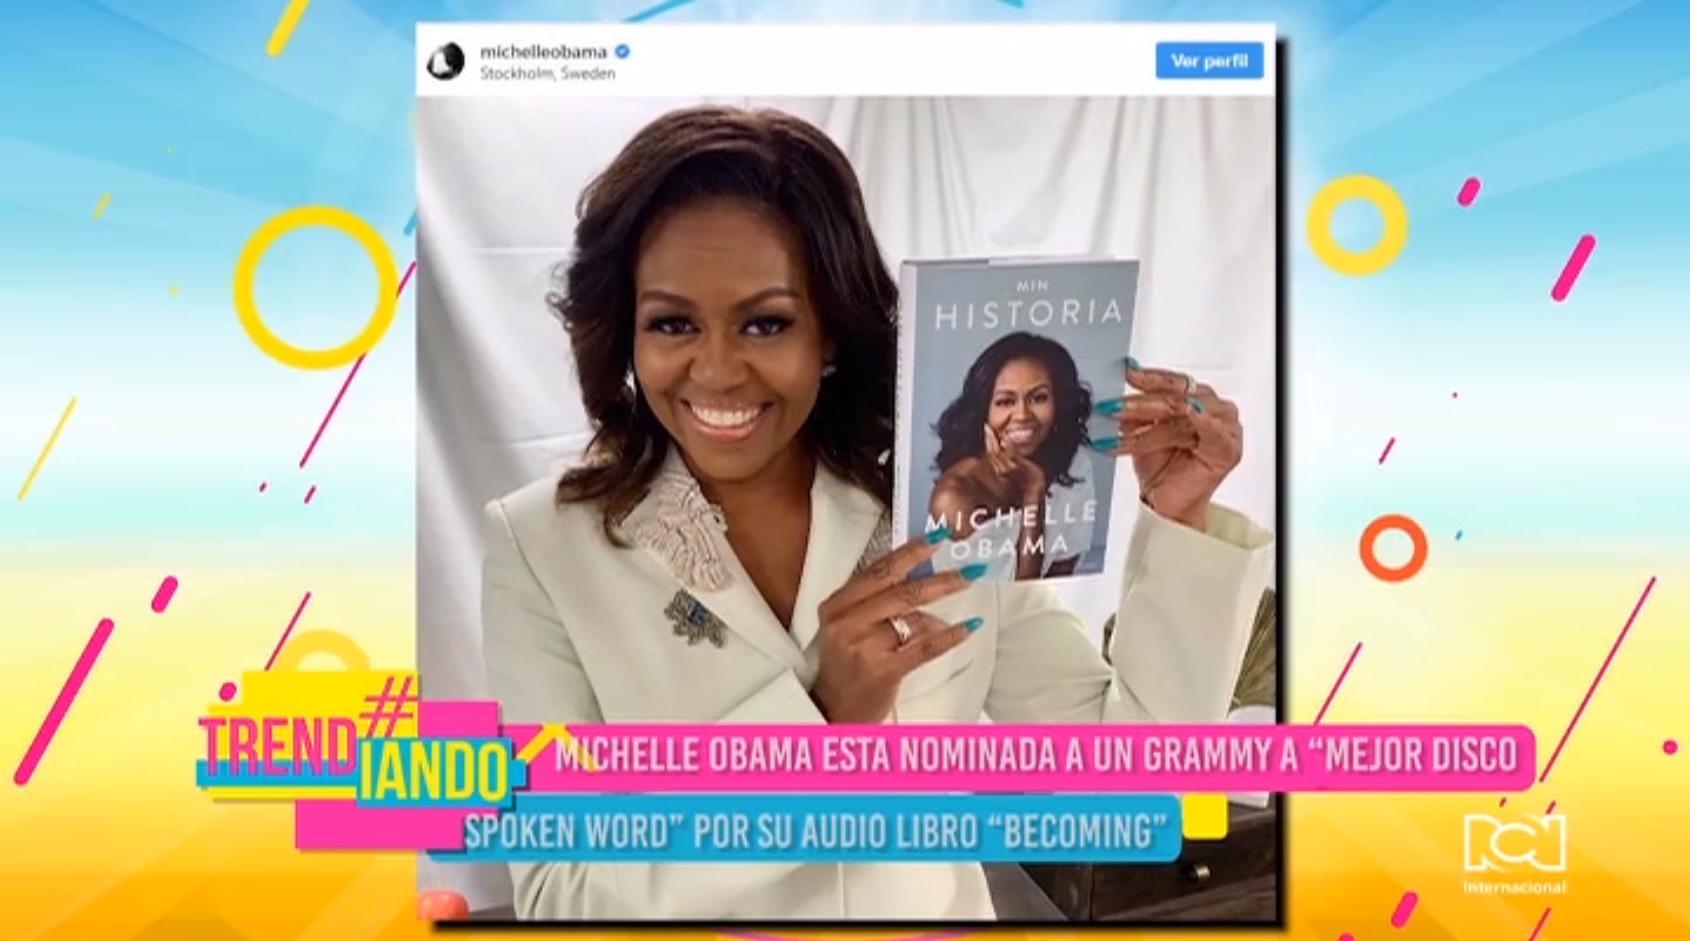 Michelle Obama y Ellen Degeneres nominadas al Grammy